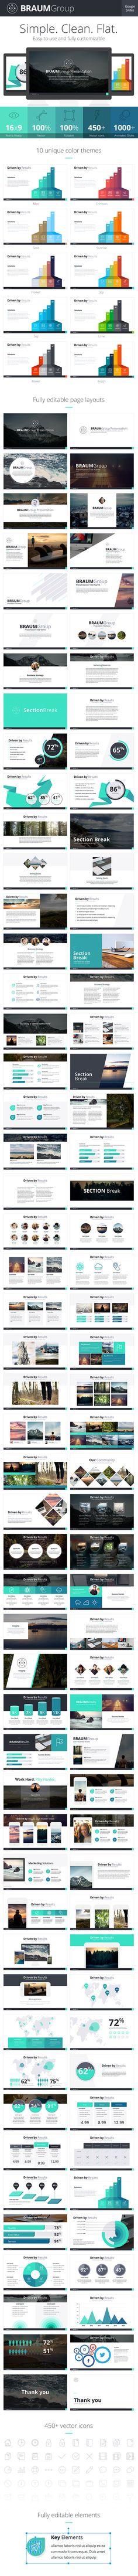 Braum Google slides Presentation Template #design Download: http://graphicriver.net/item/braum-google-slides-presentation-template/13086223?ref=ksioks